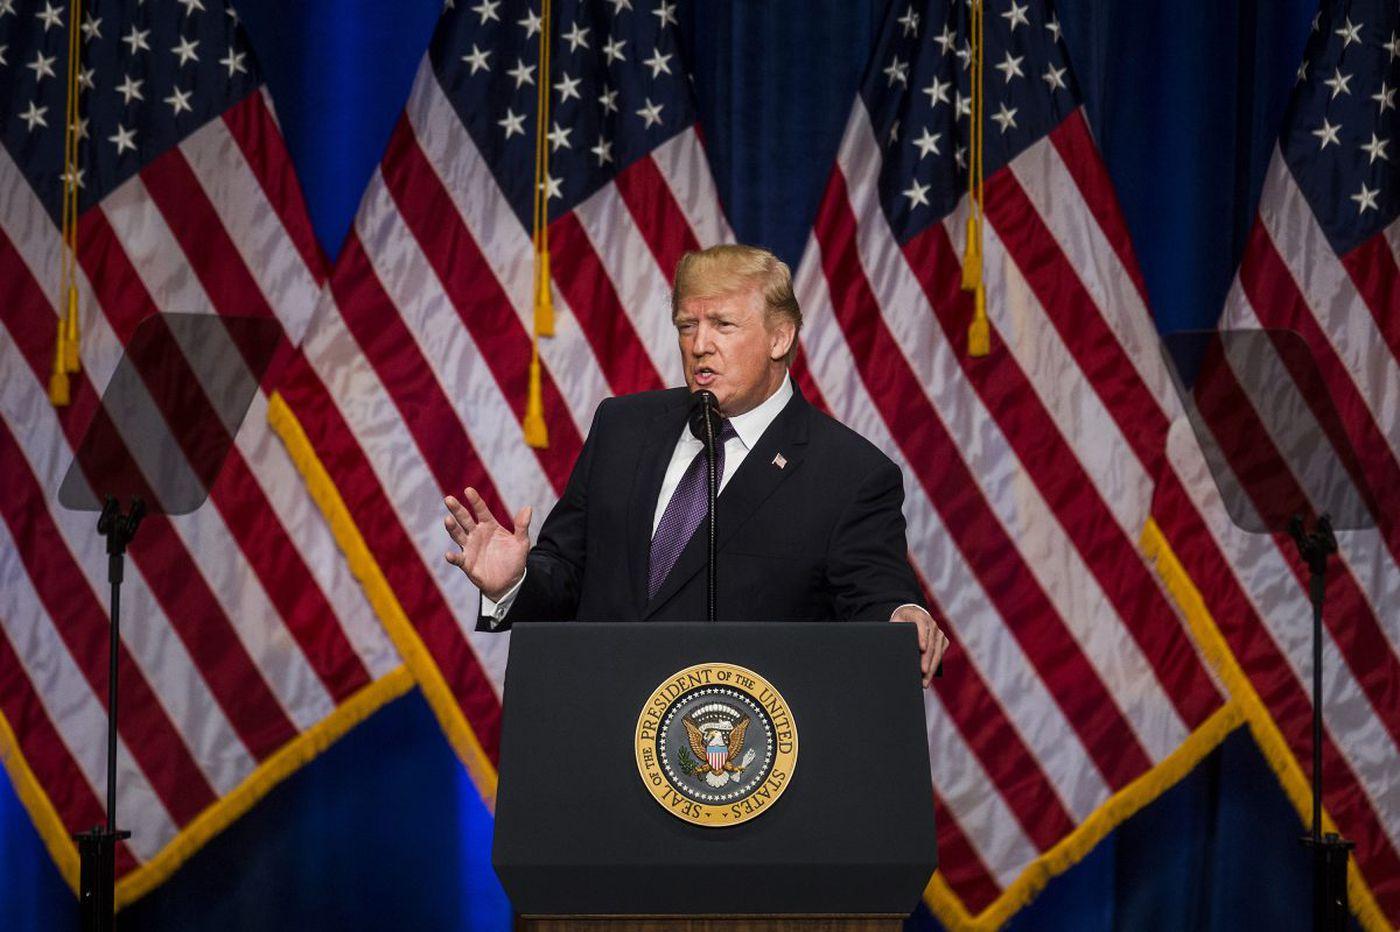 Trump team to press Mueller on status of investigation